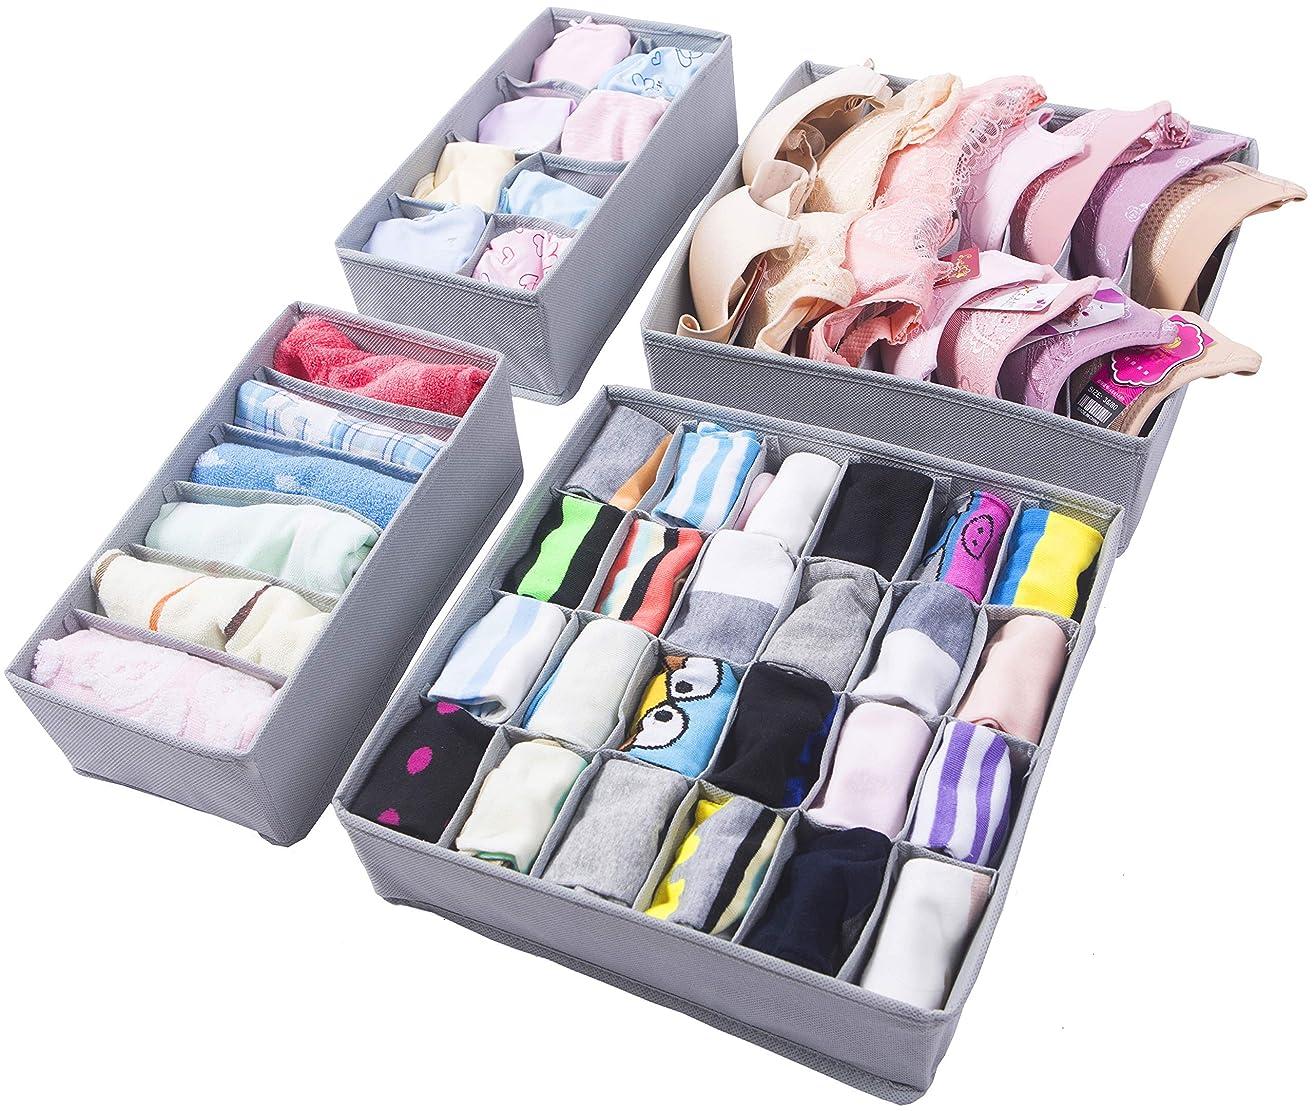 Amelitory Underwear Organizer Drawer Divider Foldable for Bras Panties Socks Ties 4 Set, Gray